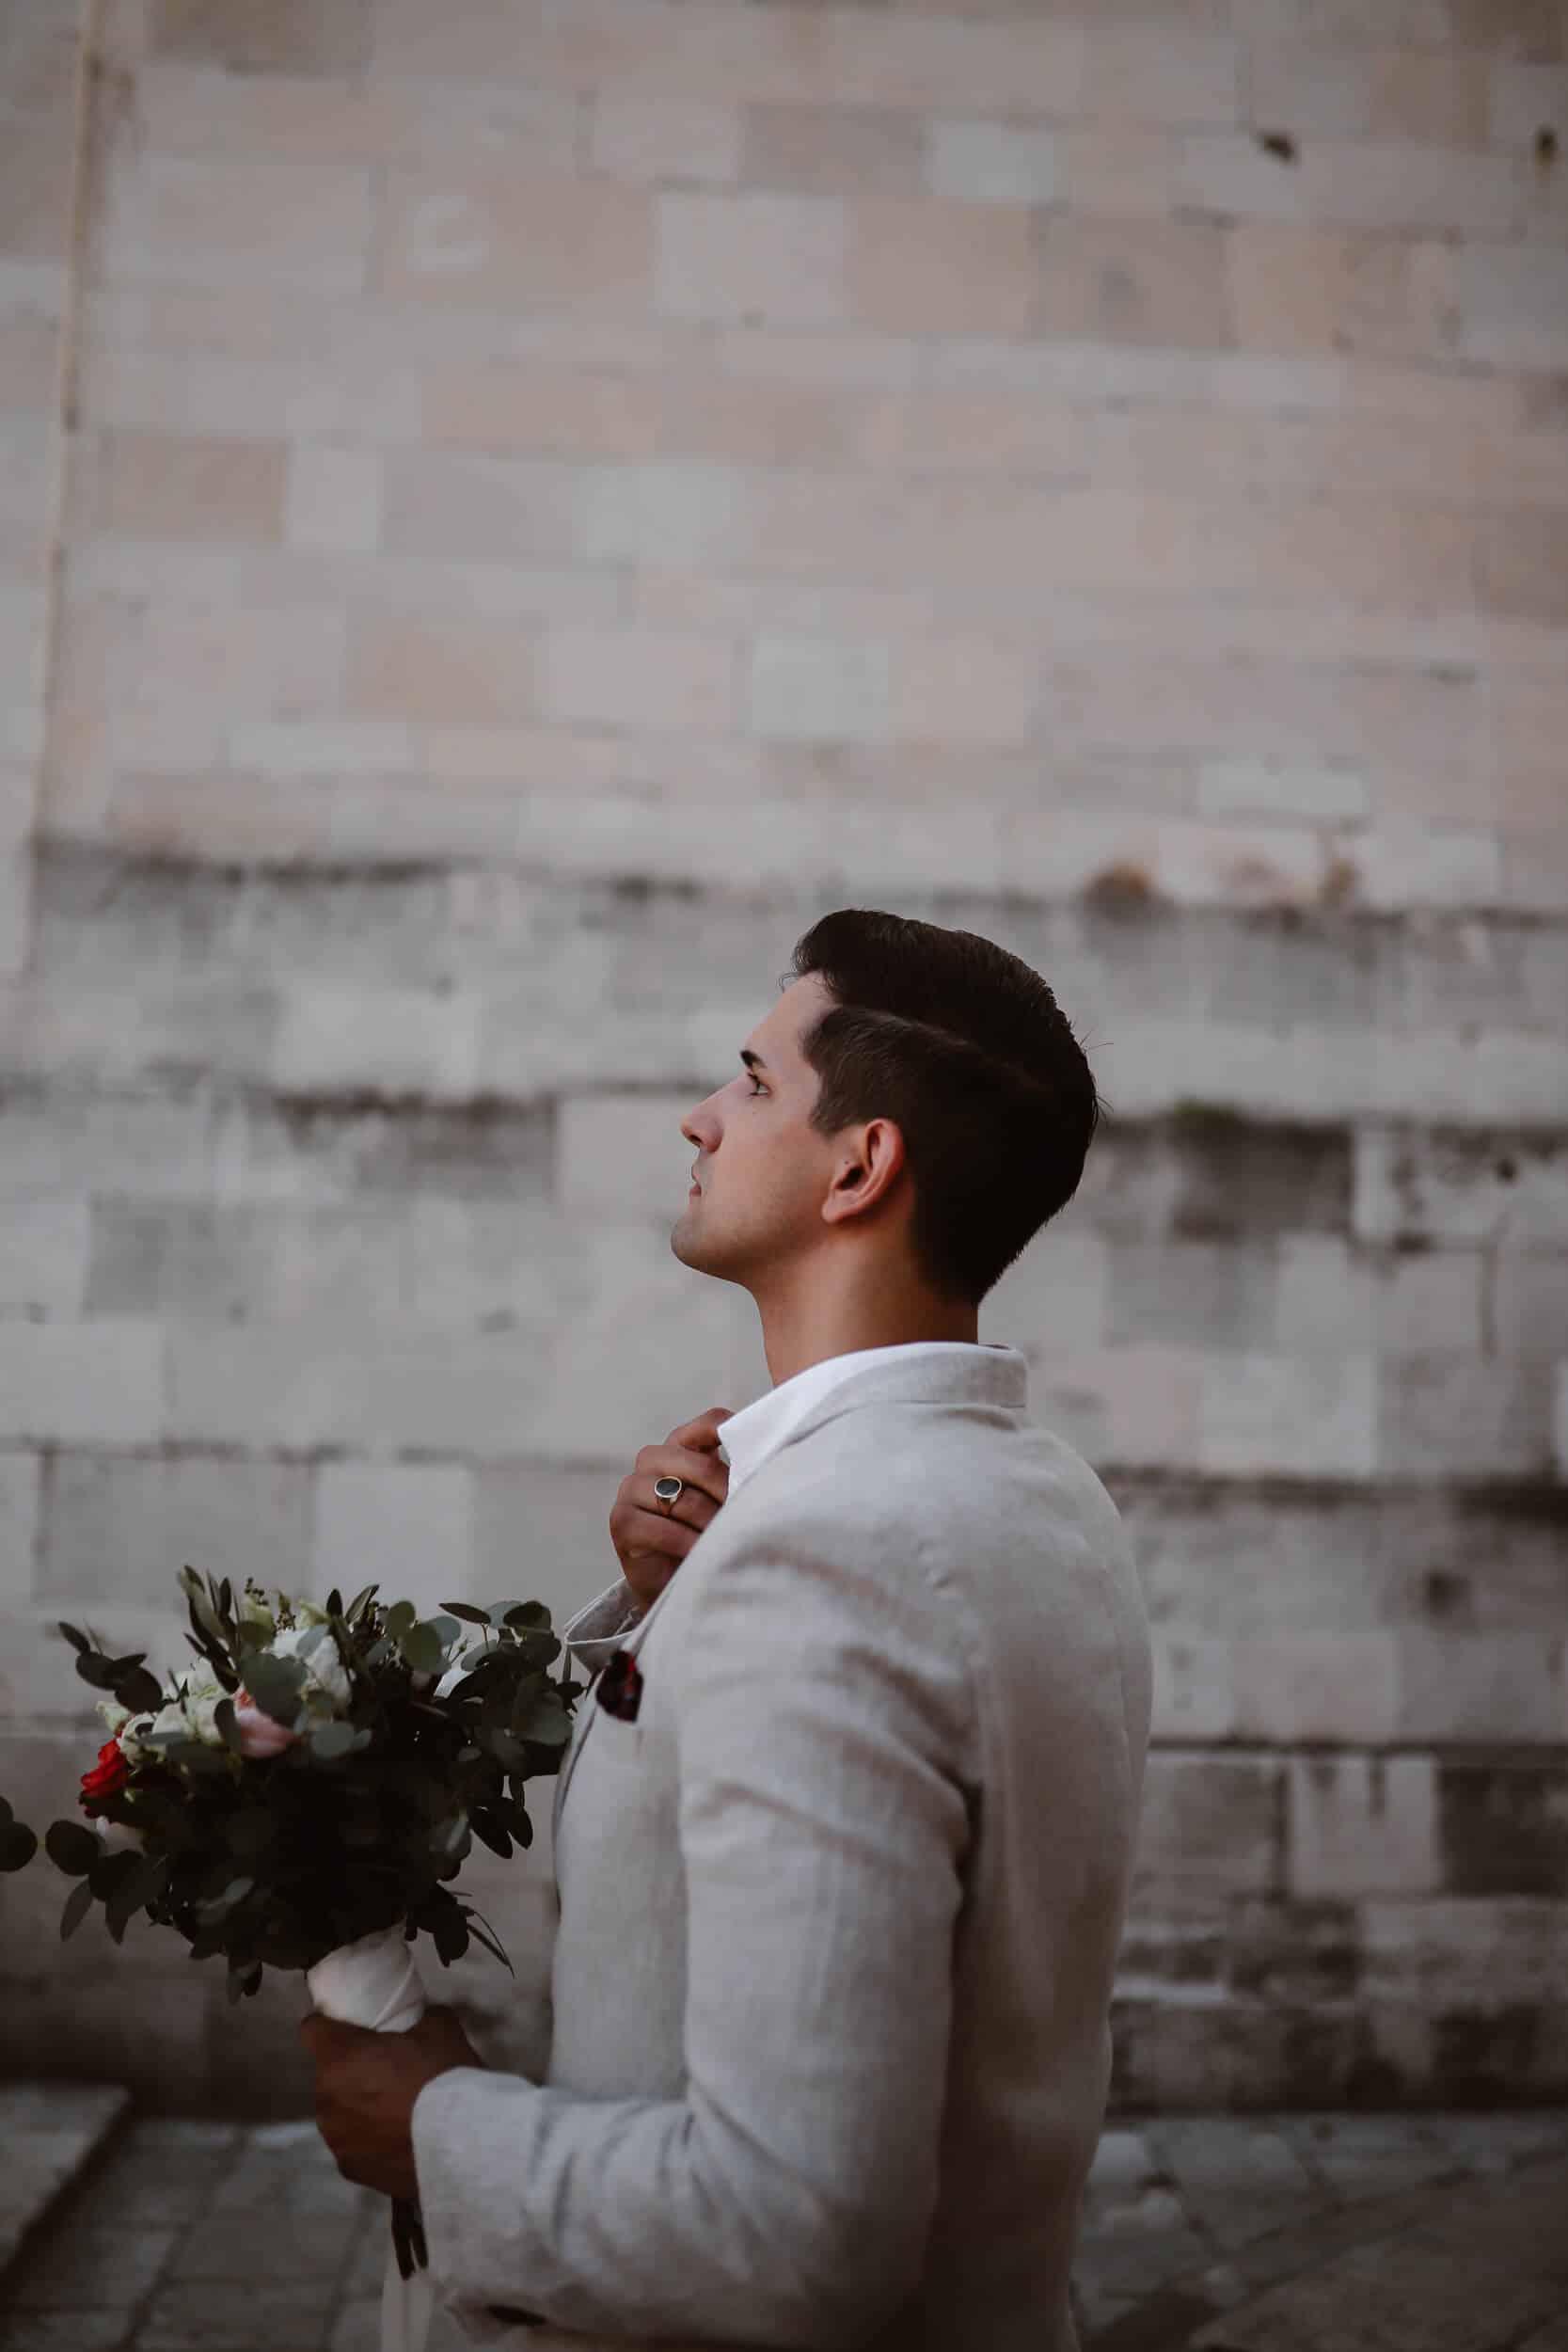 Dubrovnik karaka boat elopement matea stephan 7 | Croatia Elopement Photographer and Videographer